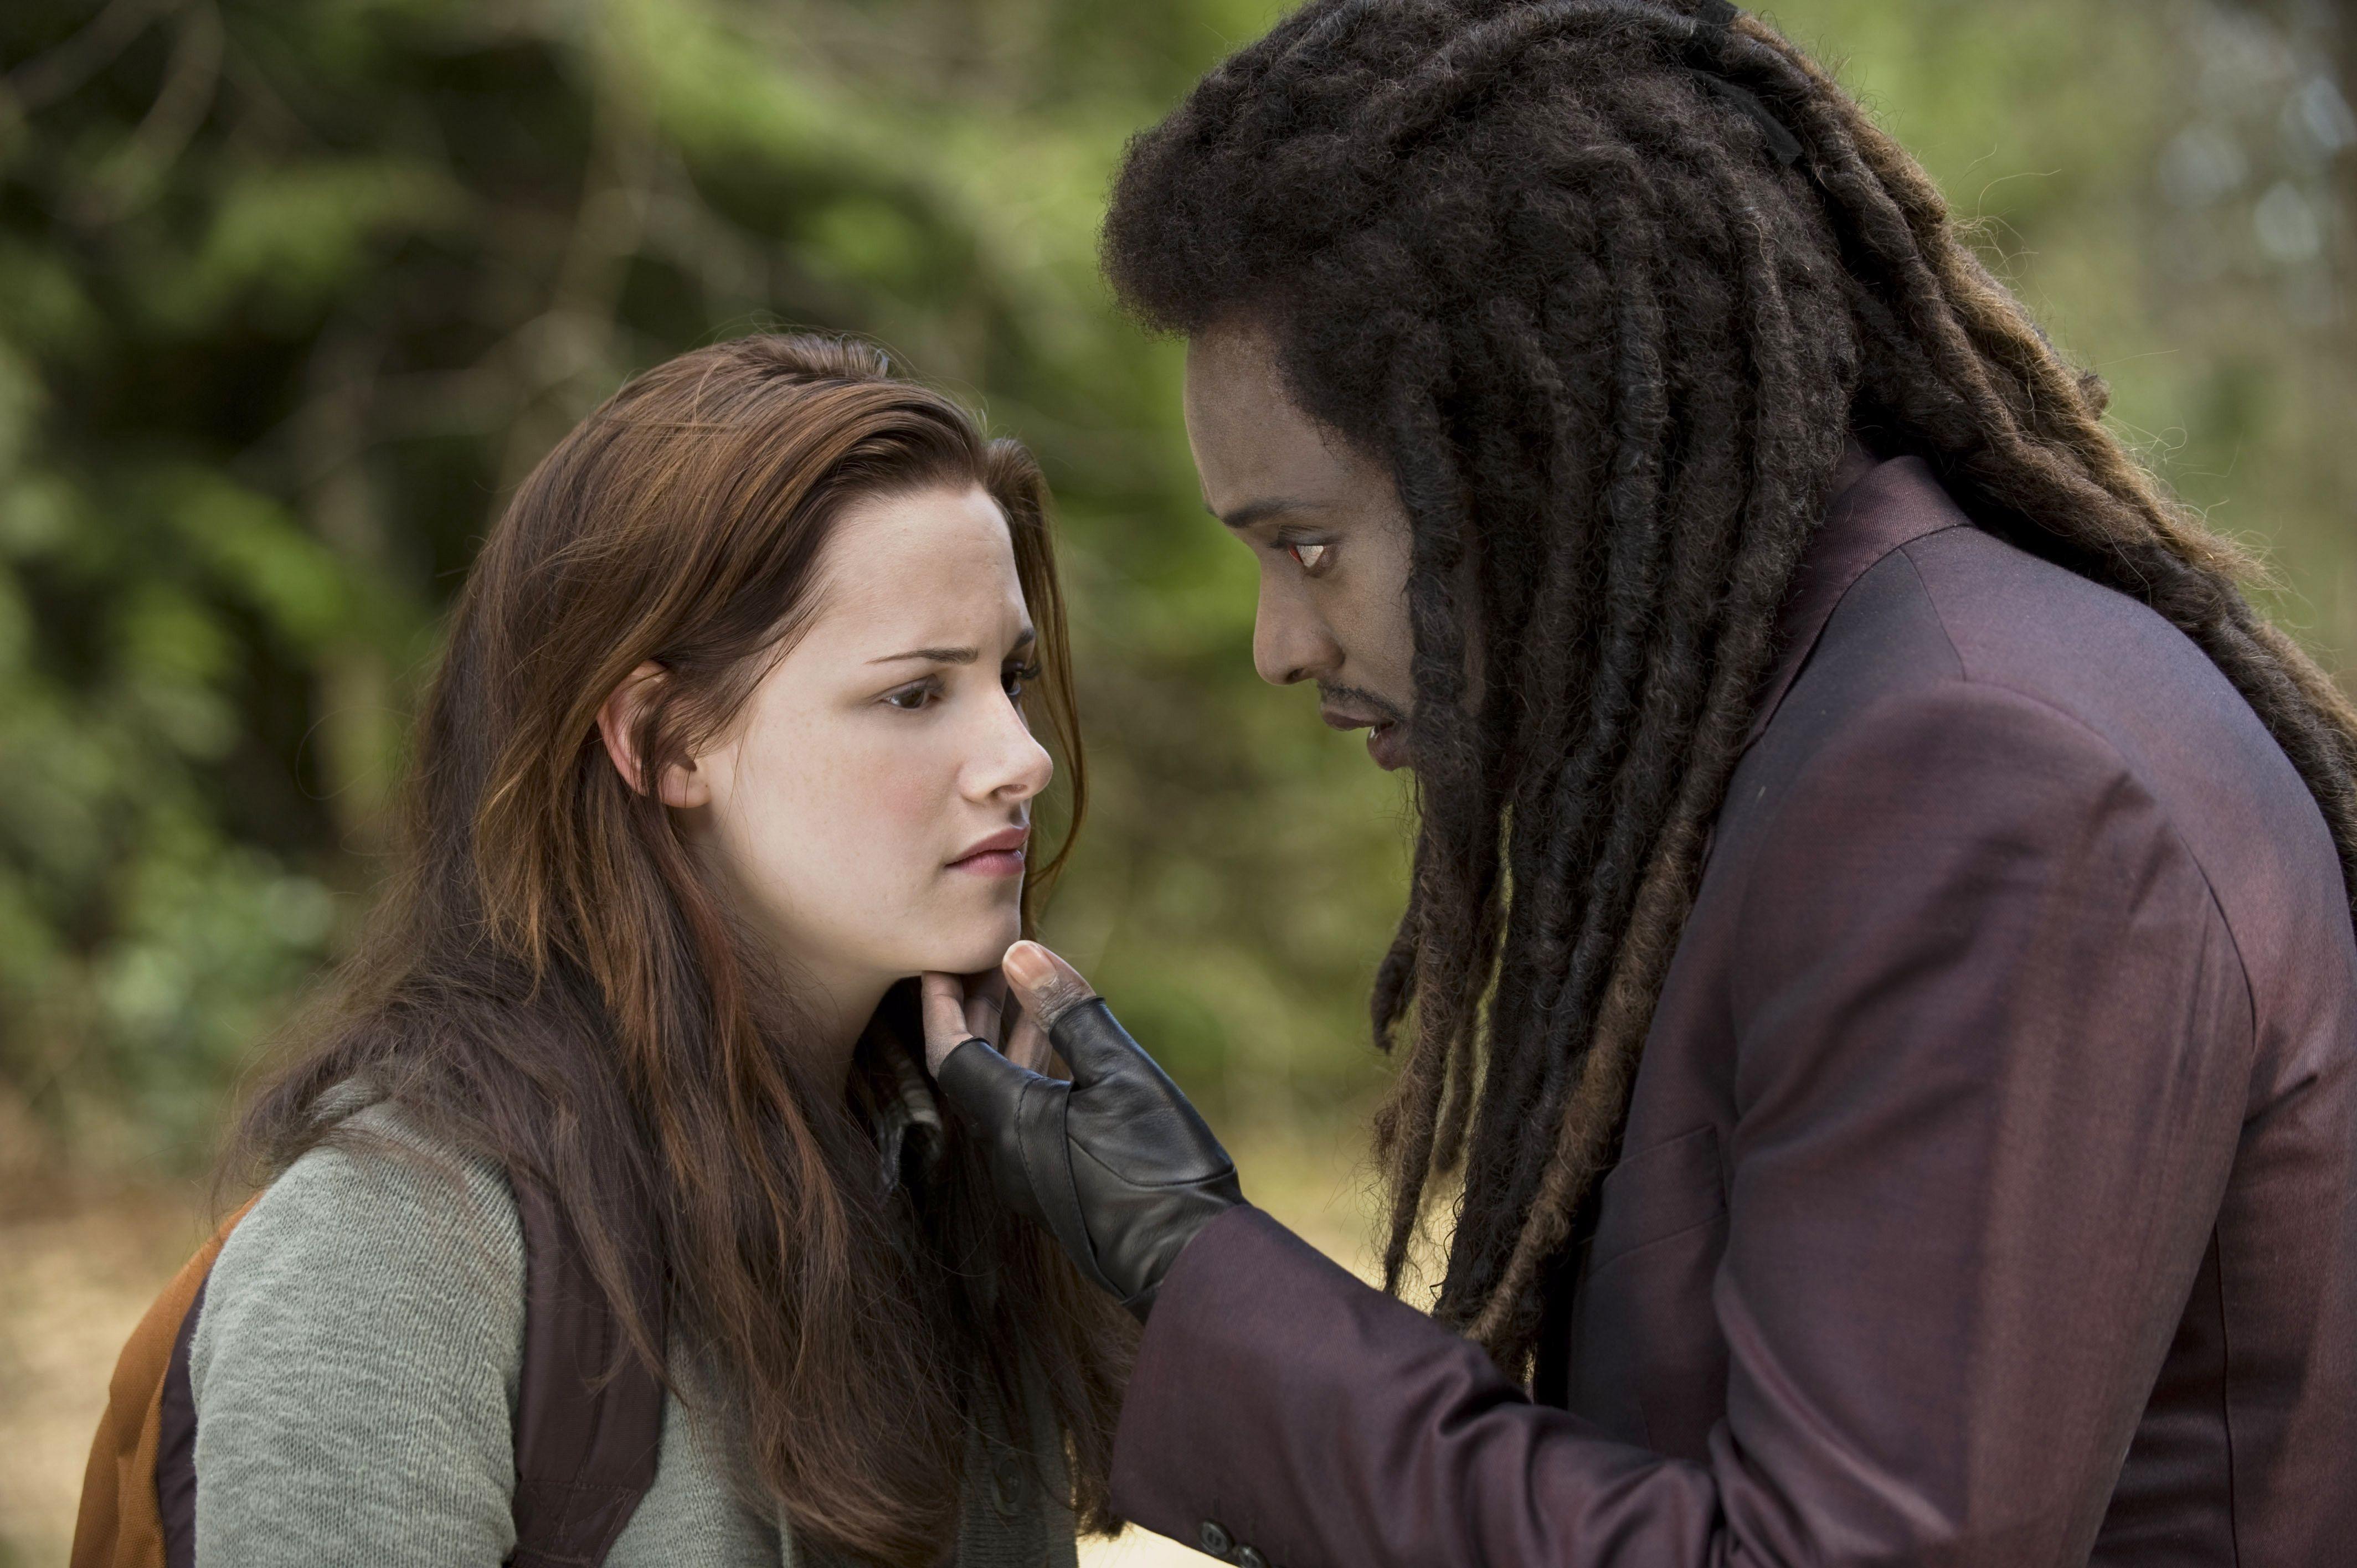 I Ll Make It Quick Laurent Finds Bella In The Meadow The Twilight Saga New Moon Twilight Saga New Moon The Twilight Saga Twilight Film